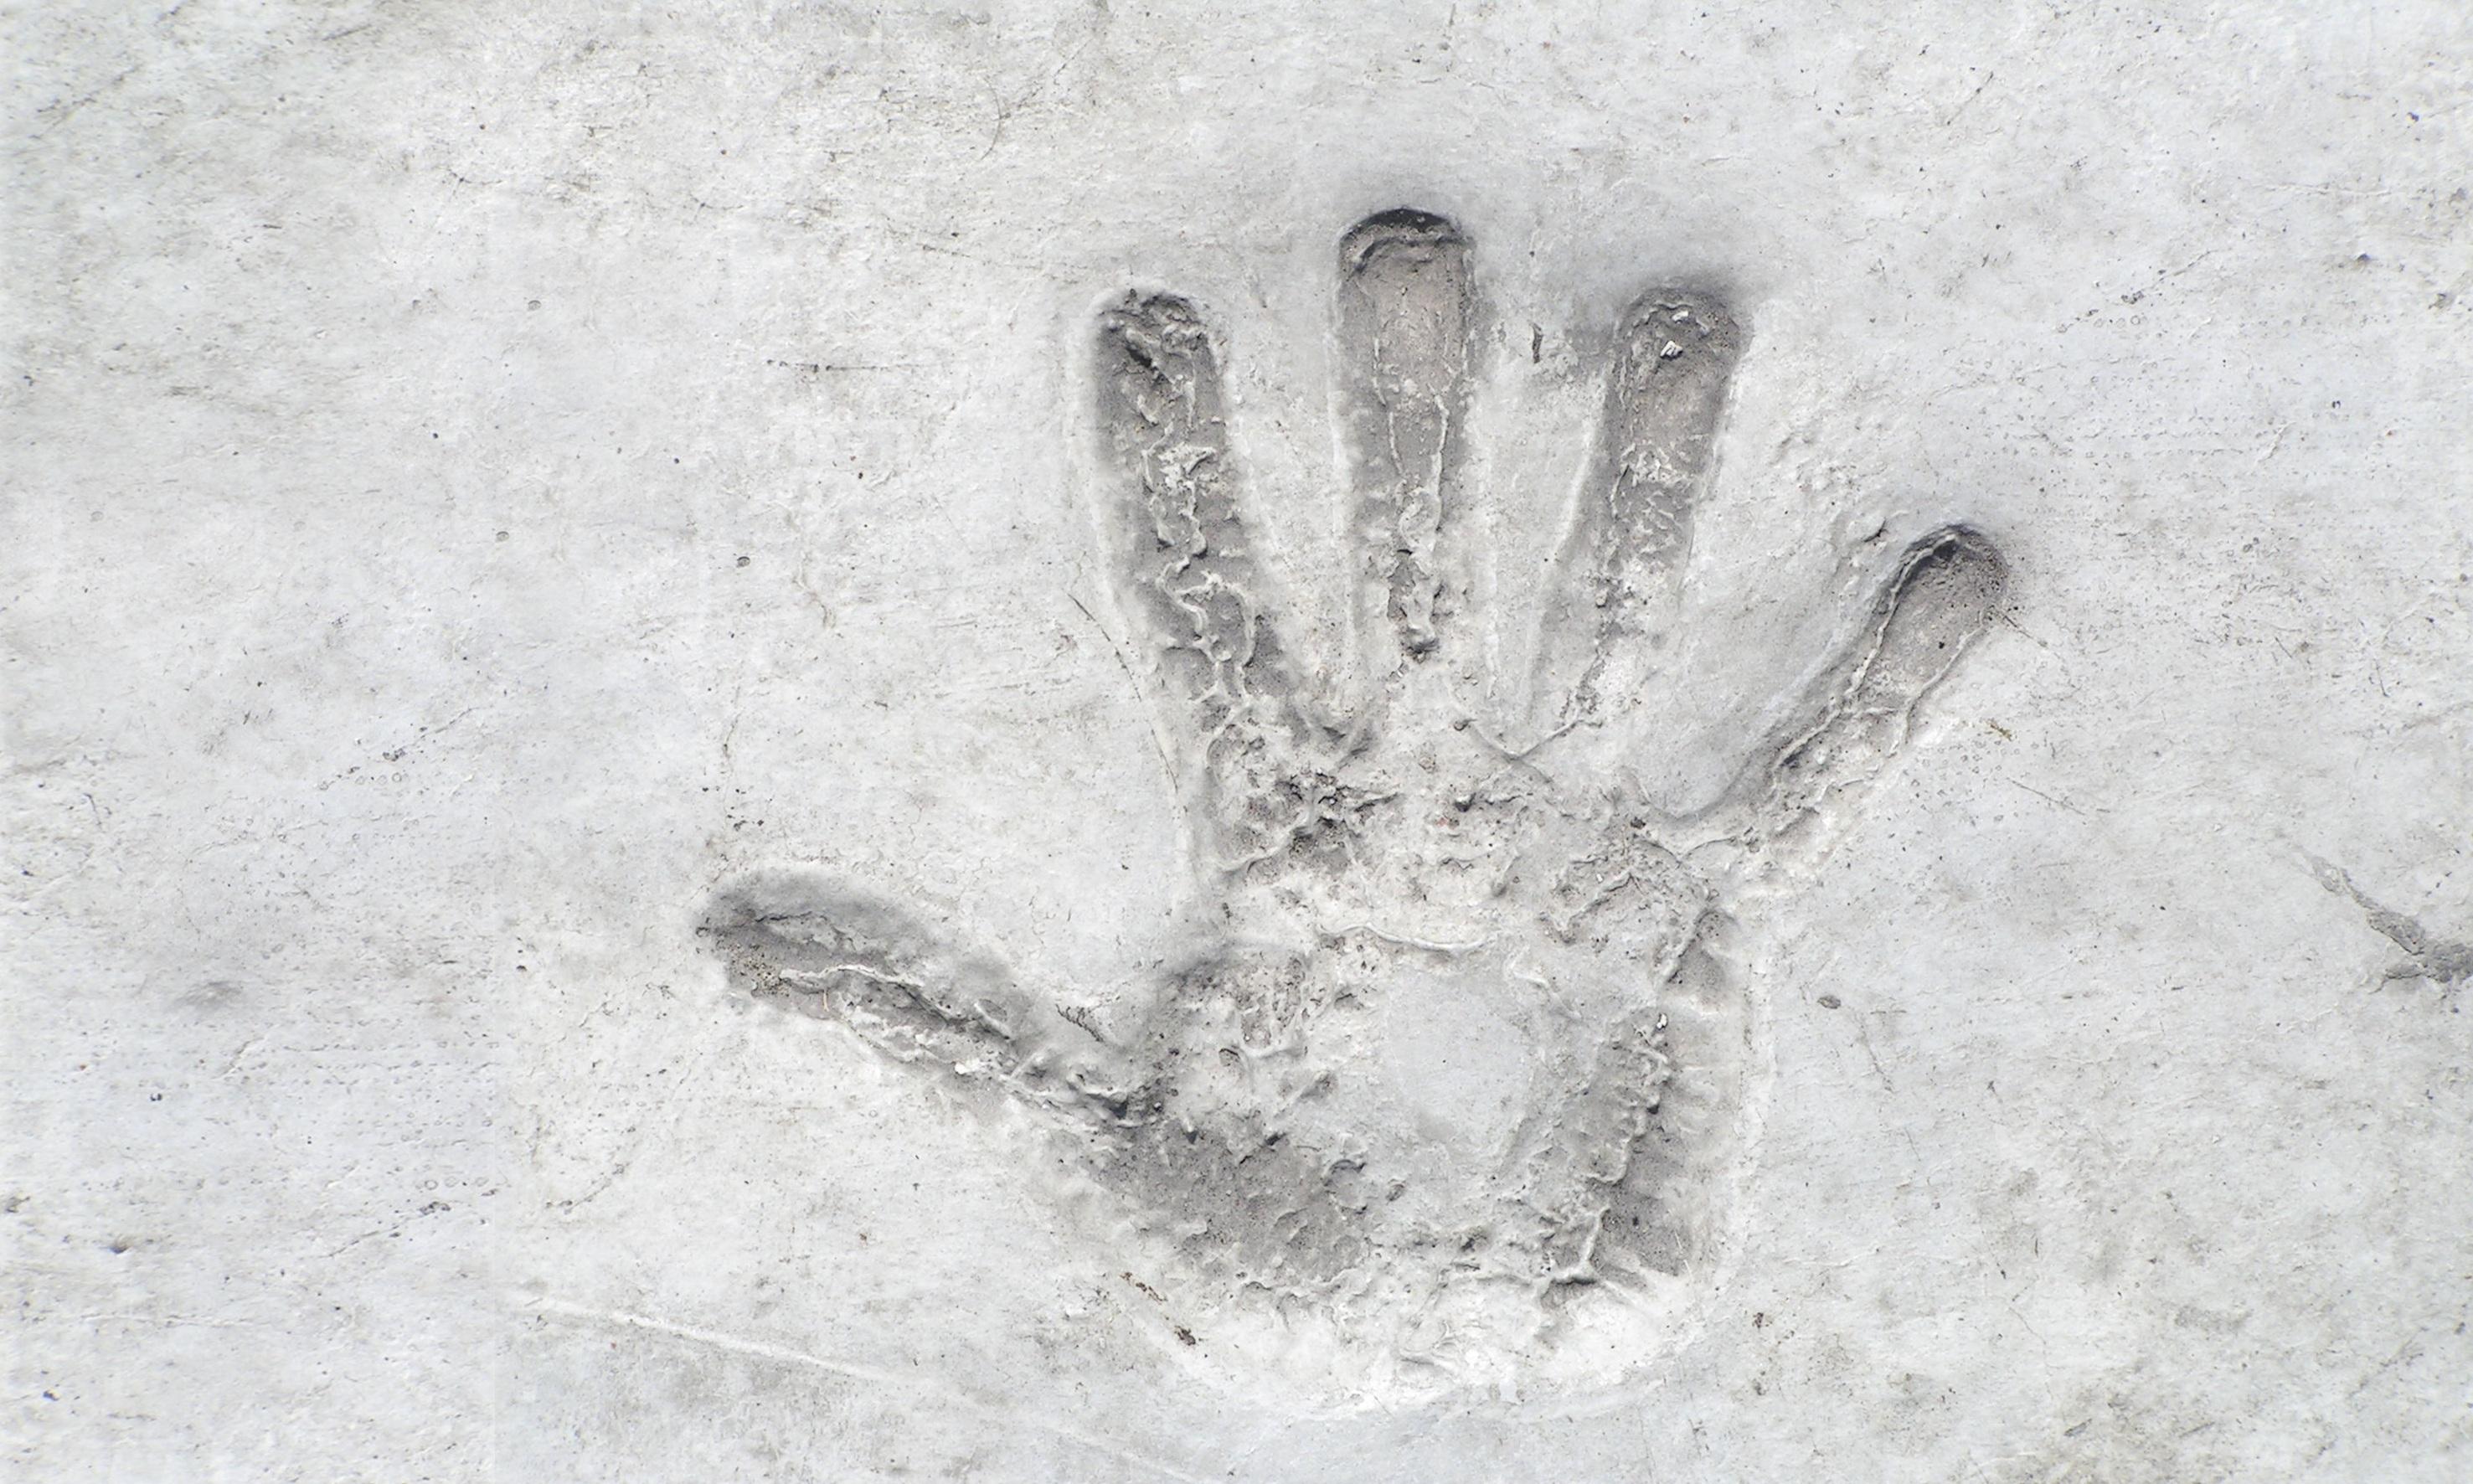 Fotos Gratis Mano Nieve Blanco Monumento Hollywood Dedo